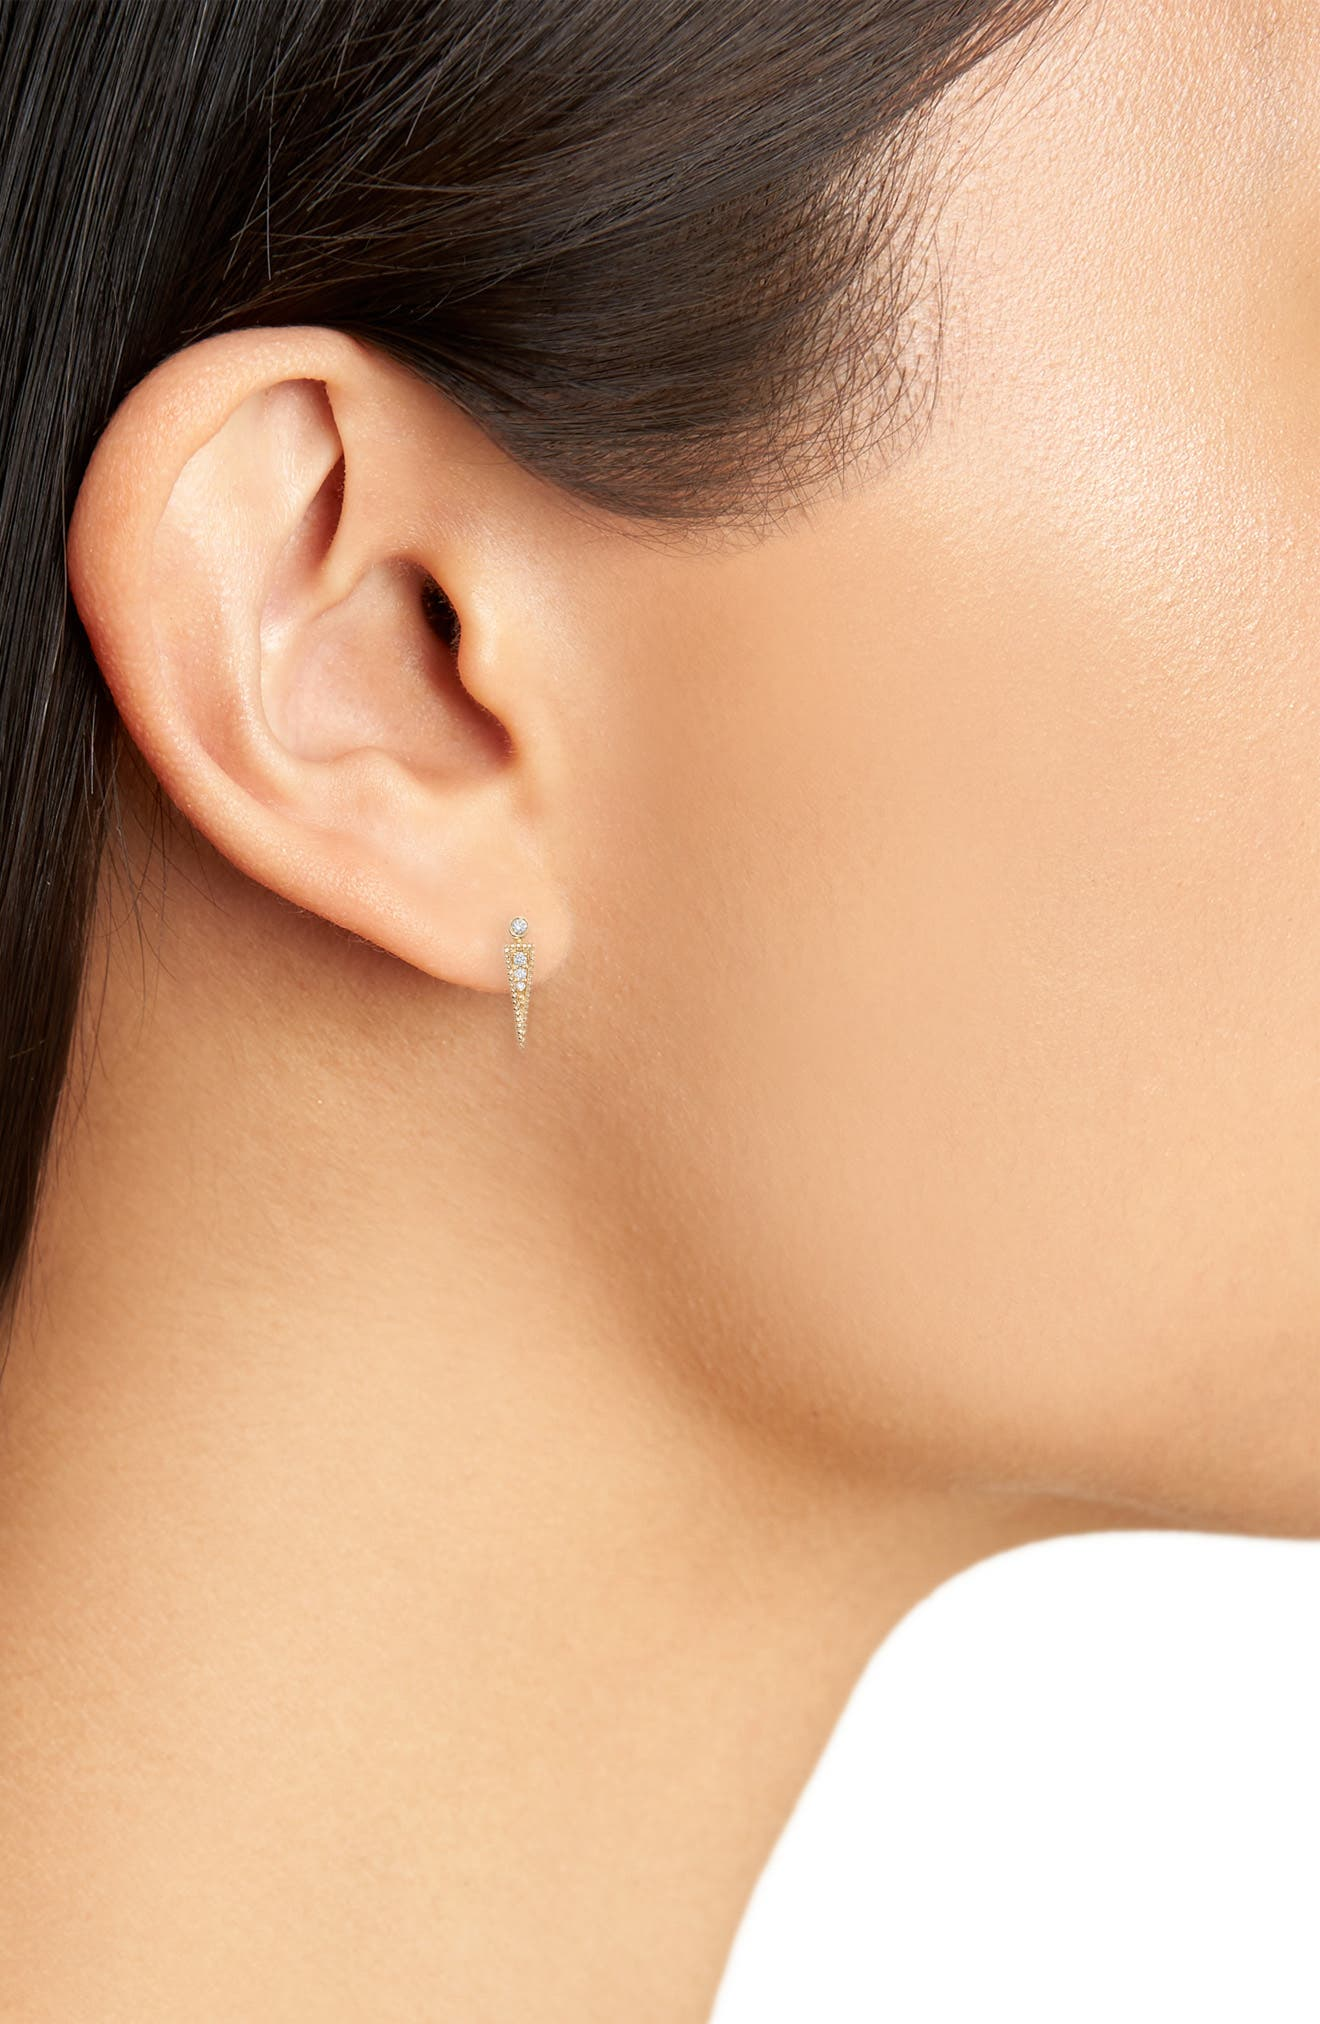 Dana Rebecca Samantha Lynn Diamond Dagger Earrings,                             Alternate thumbnail 2, color,                             YELLOW GOLD